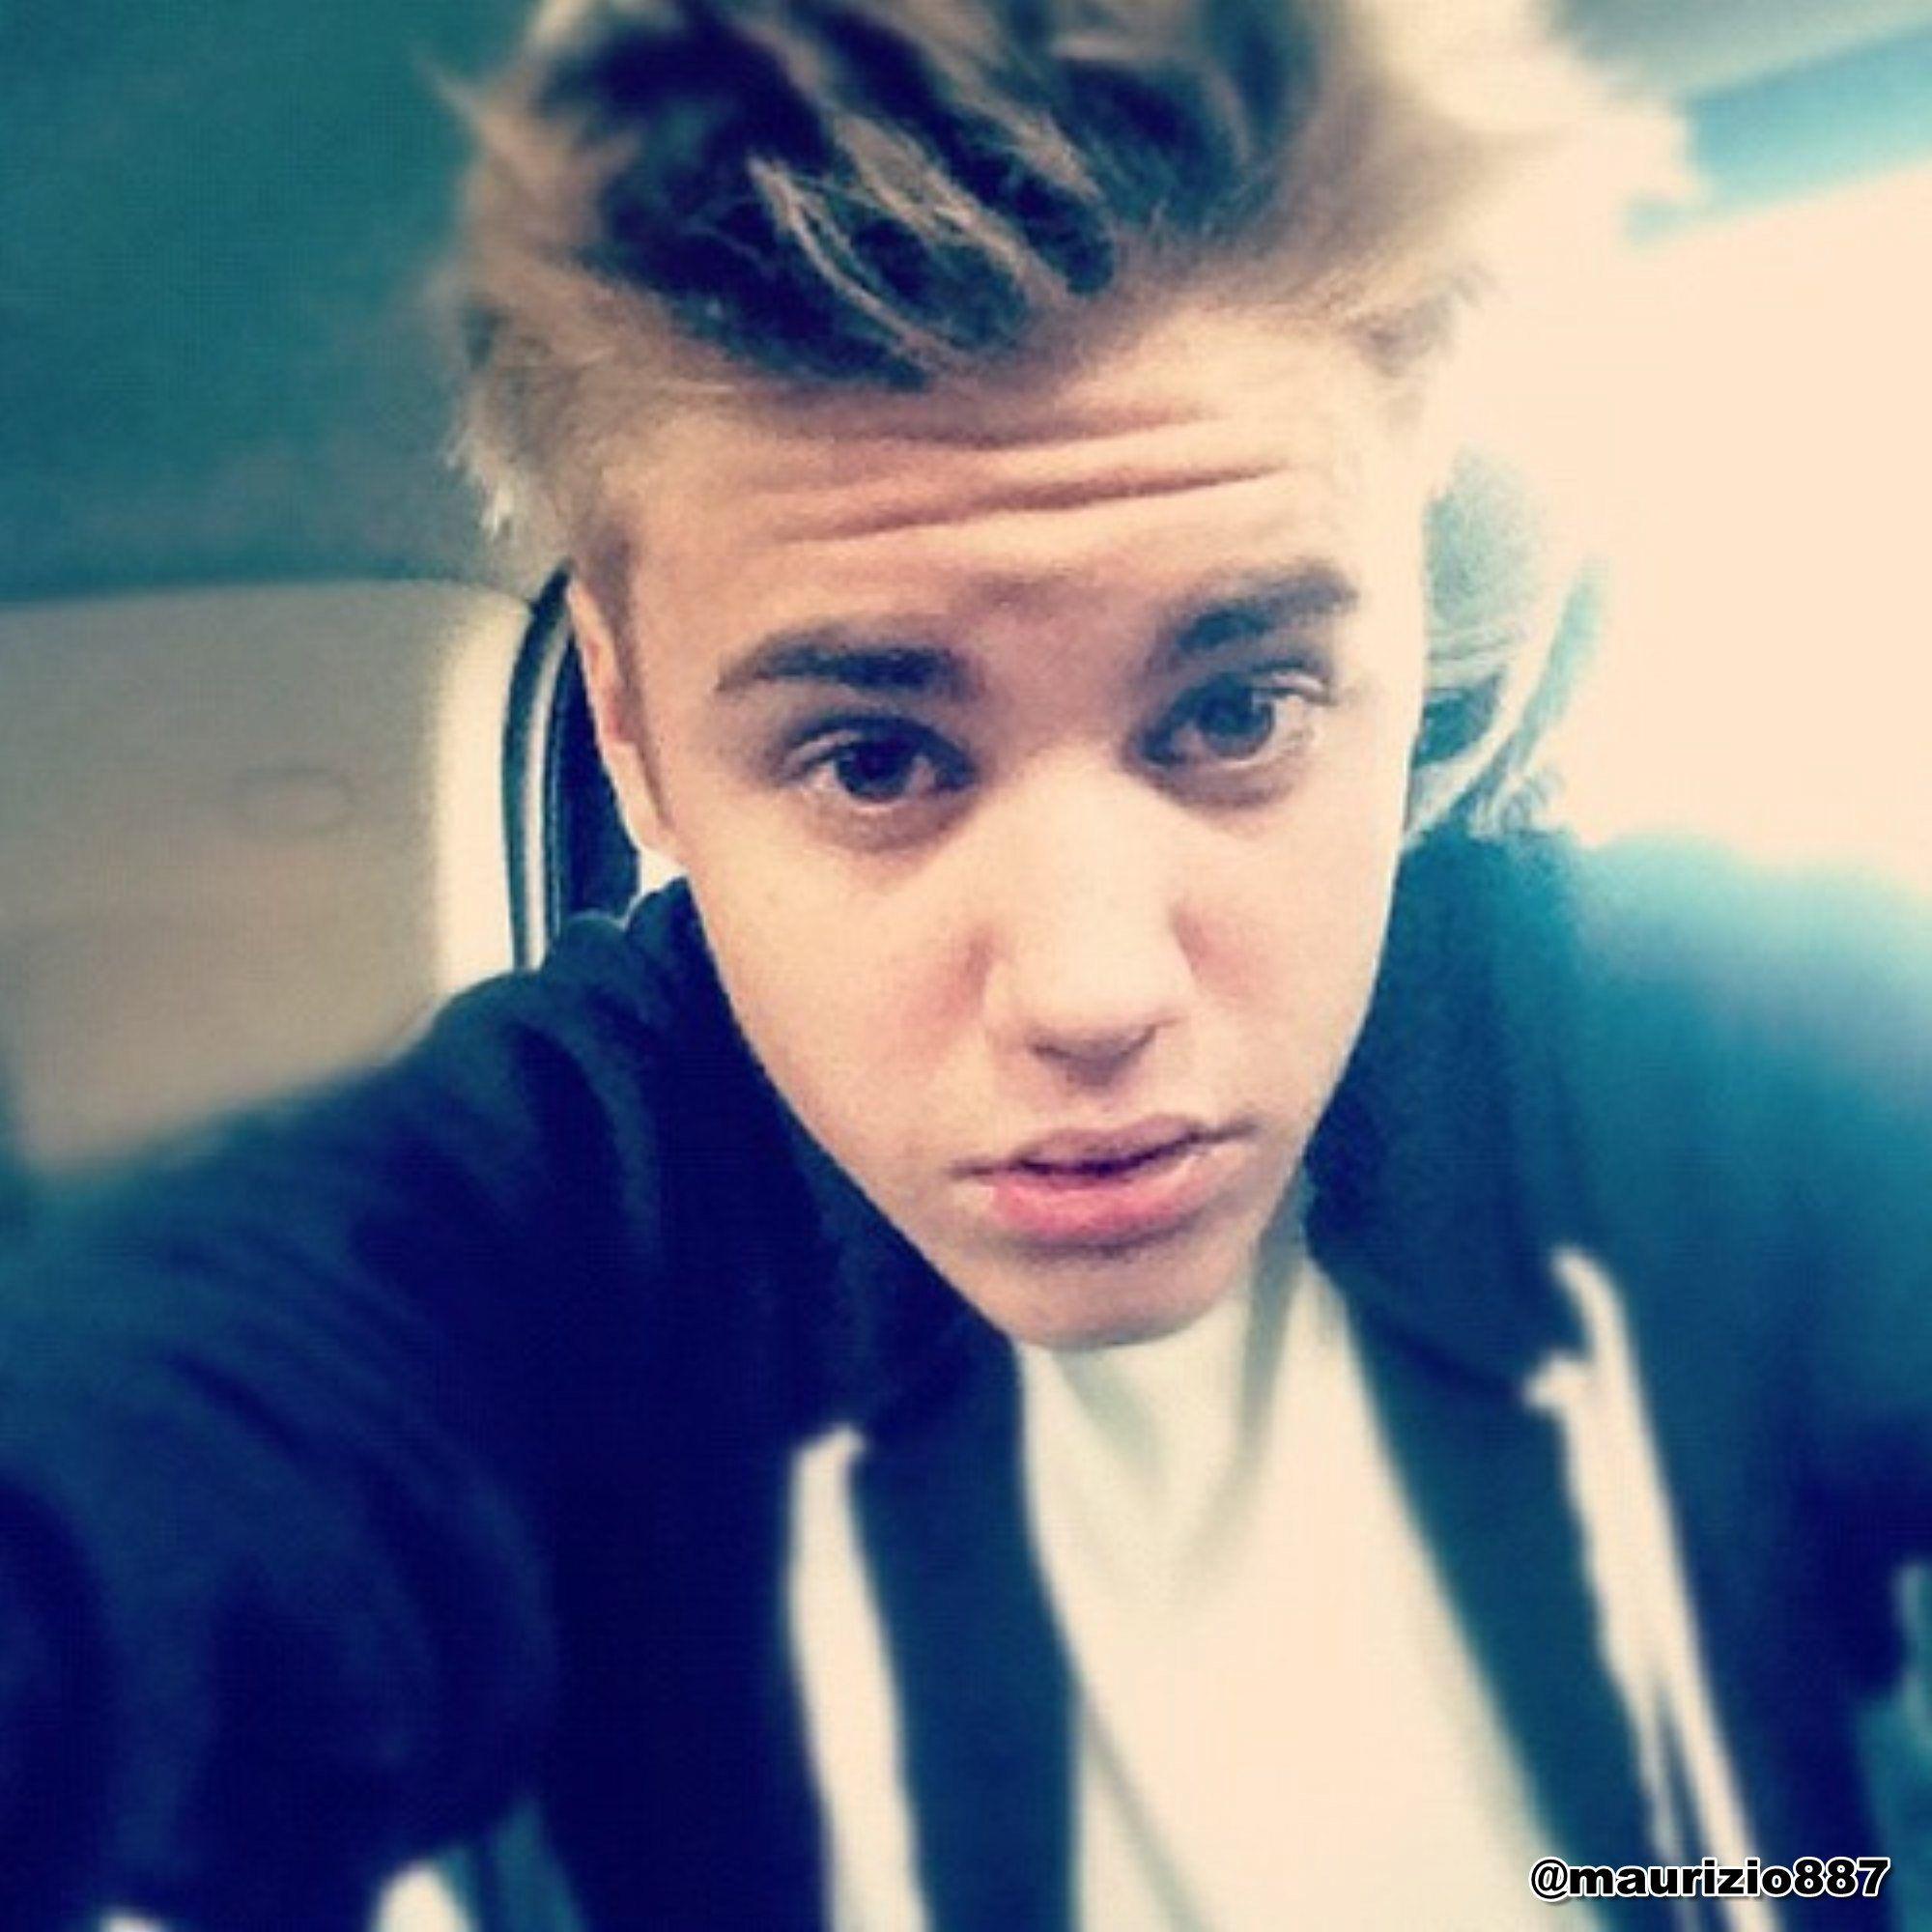 justin bieber, 2012 | Justin Bieber | Justin bieber photos